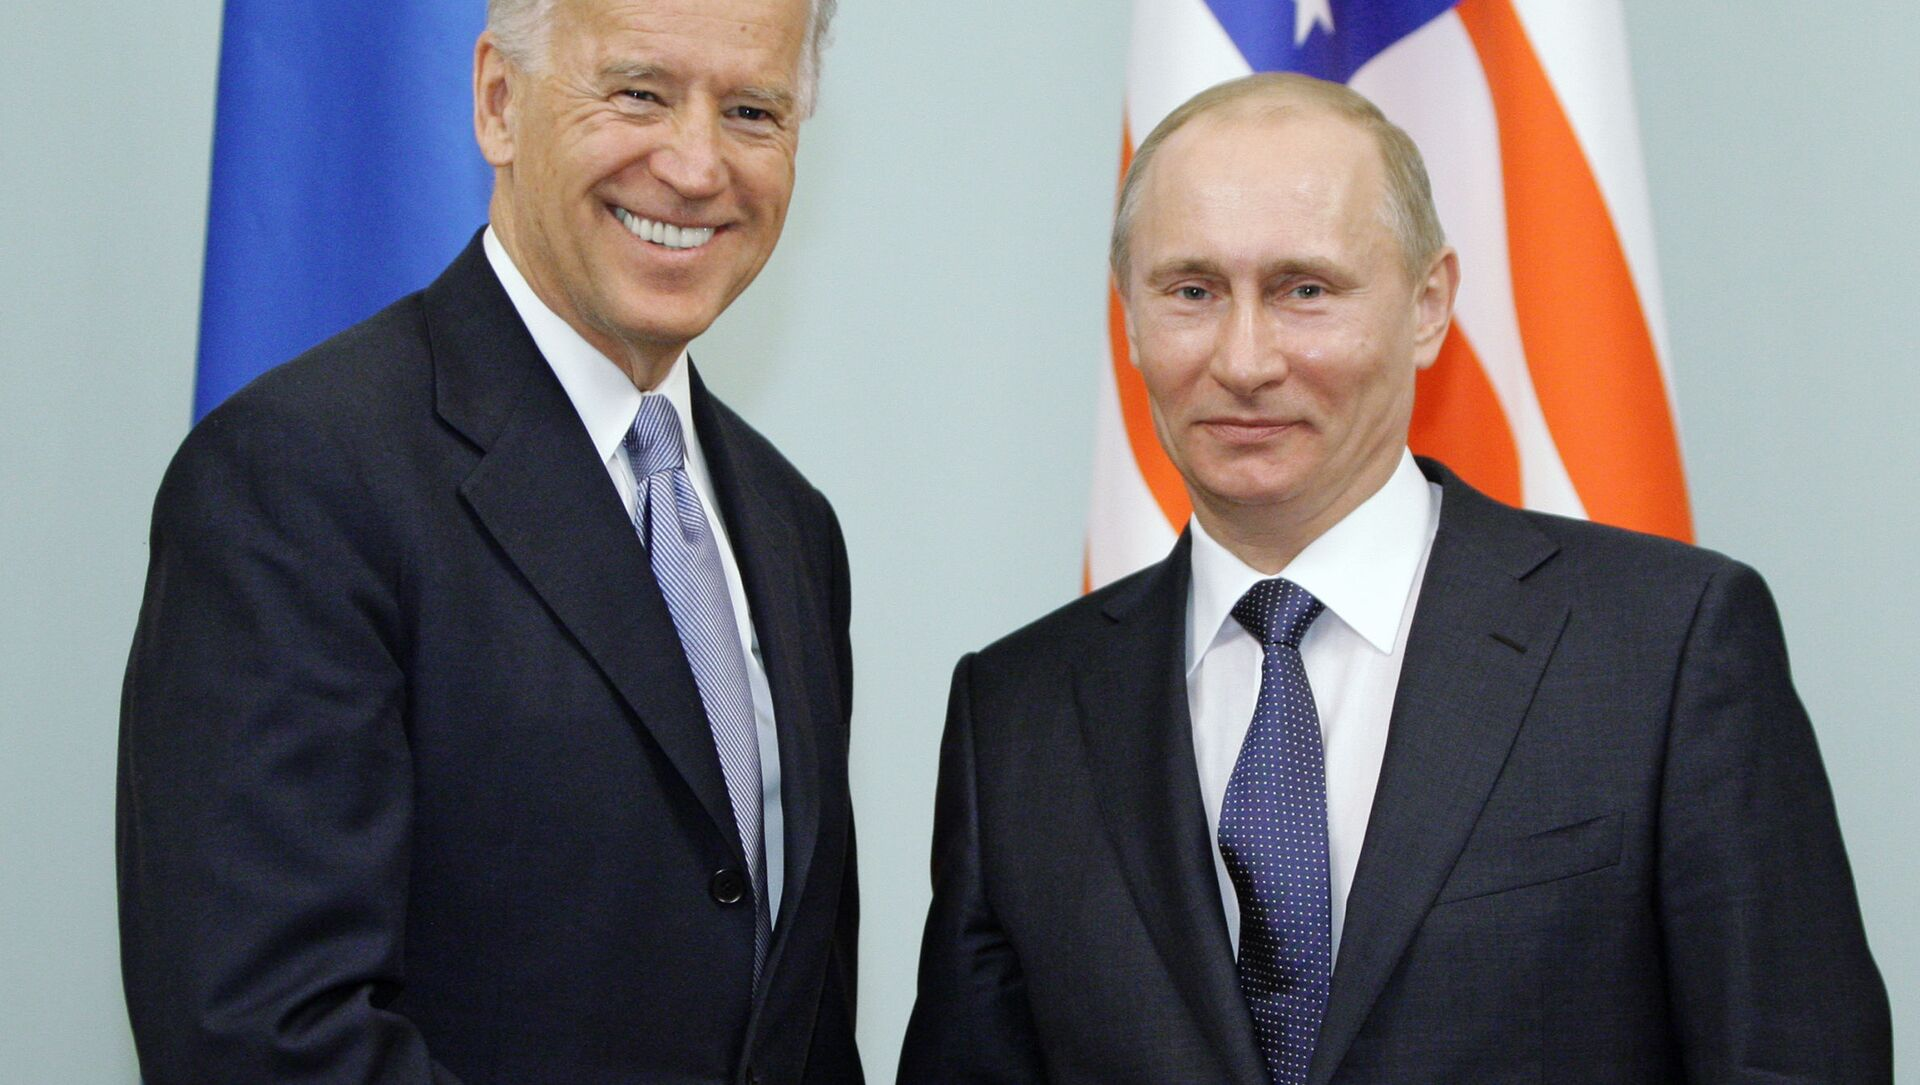 Joe Biden i Władimir Putin - Sputnik Polska, 1920, 25.05.2021